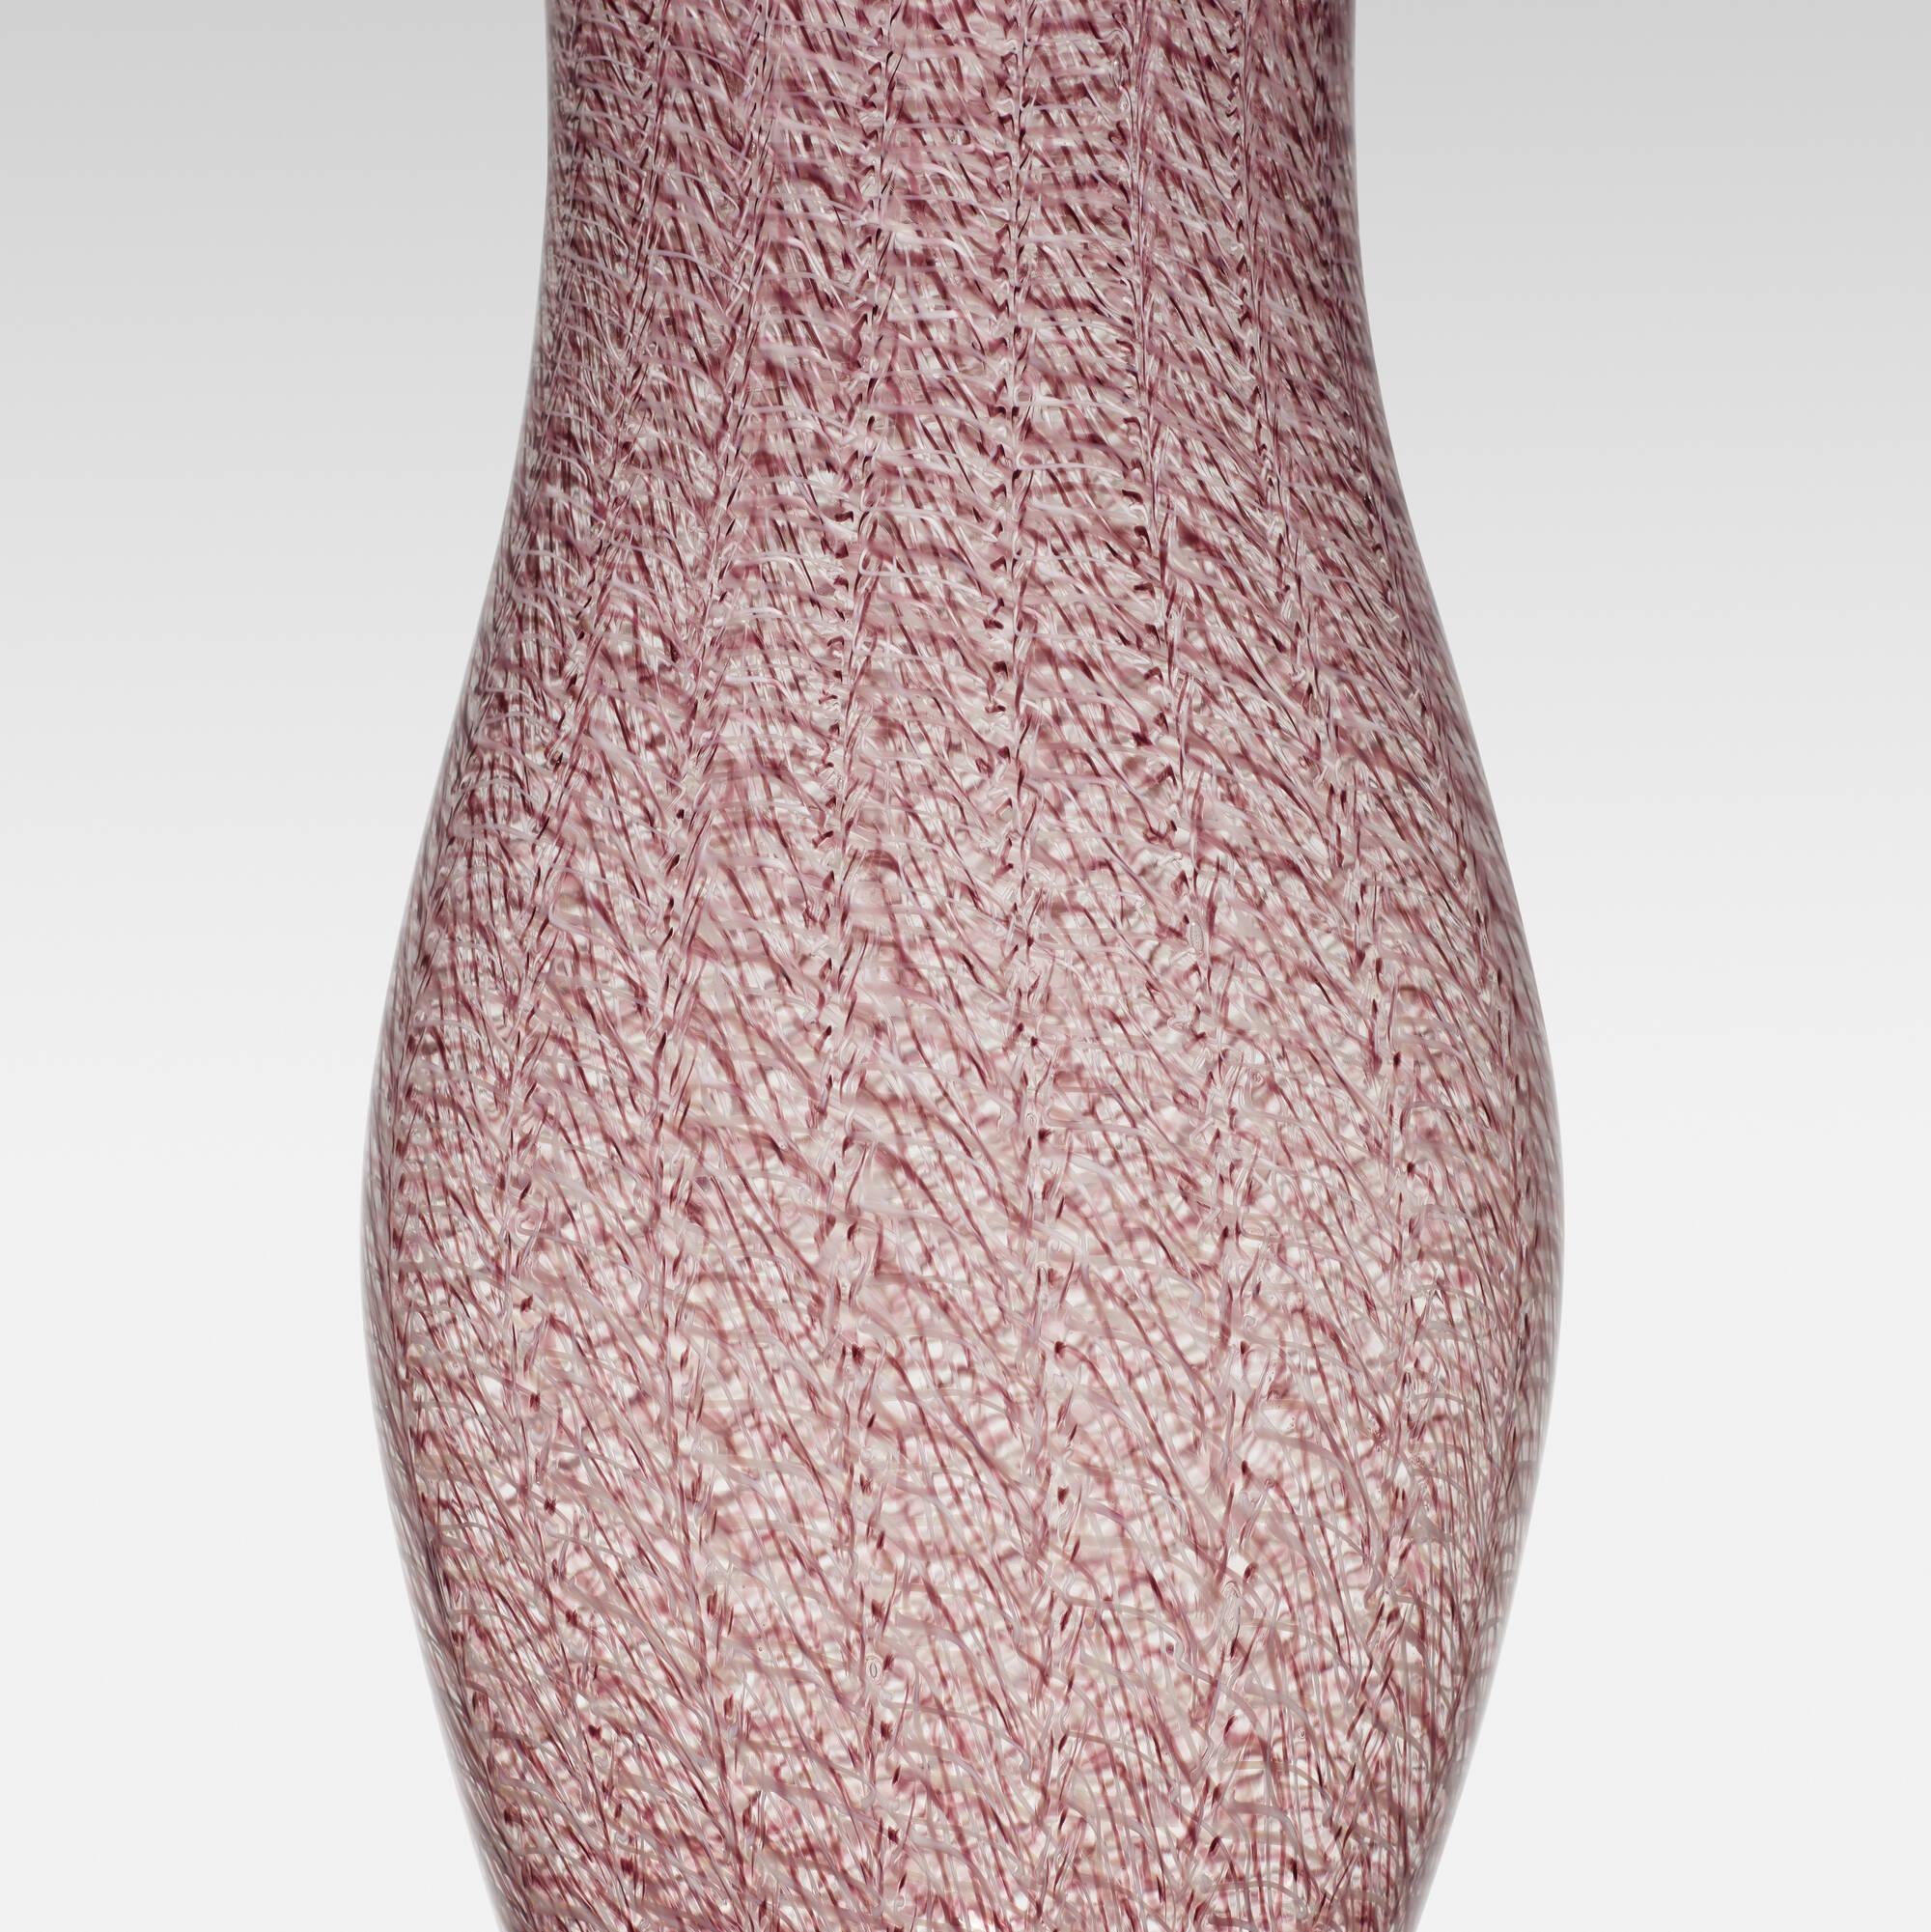 169: Archimede Seguso / Merletto vase (2 of 3)